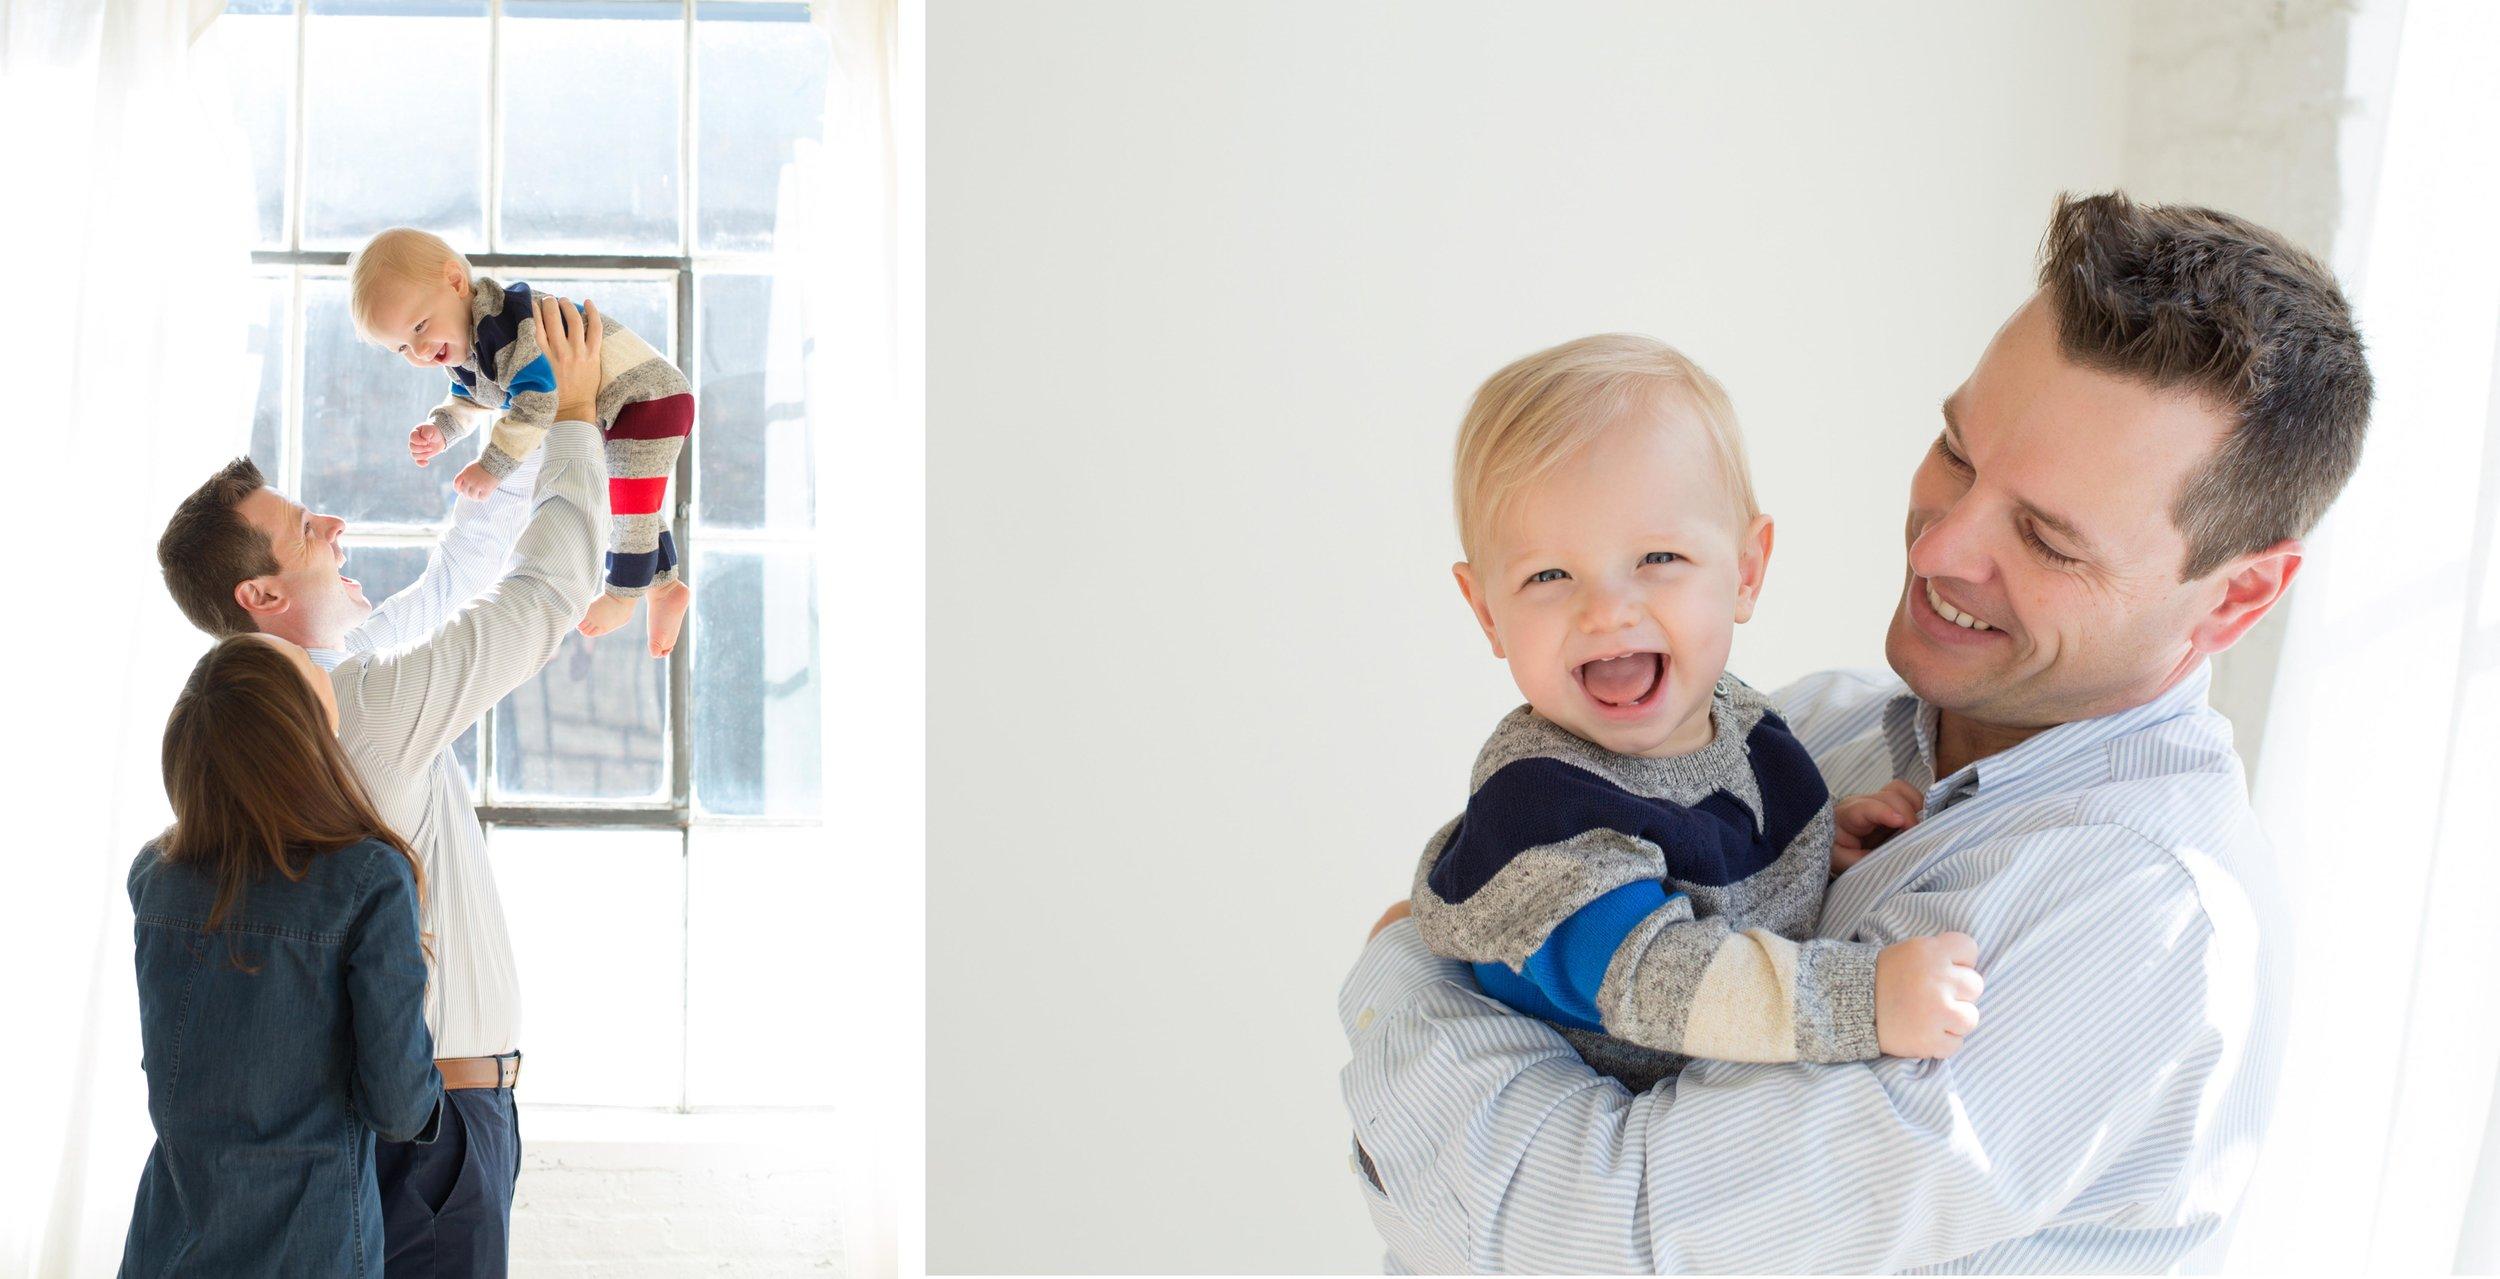 Cute_Family_Laughing_In Studio.jpg